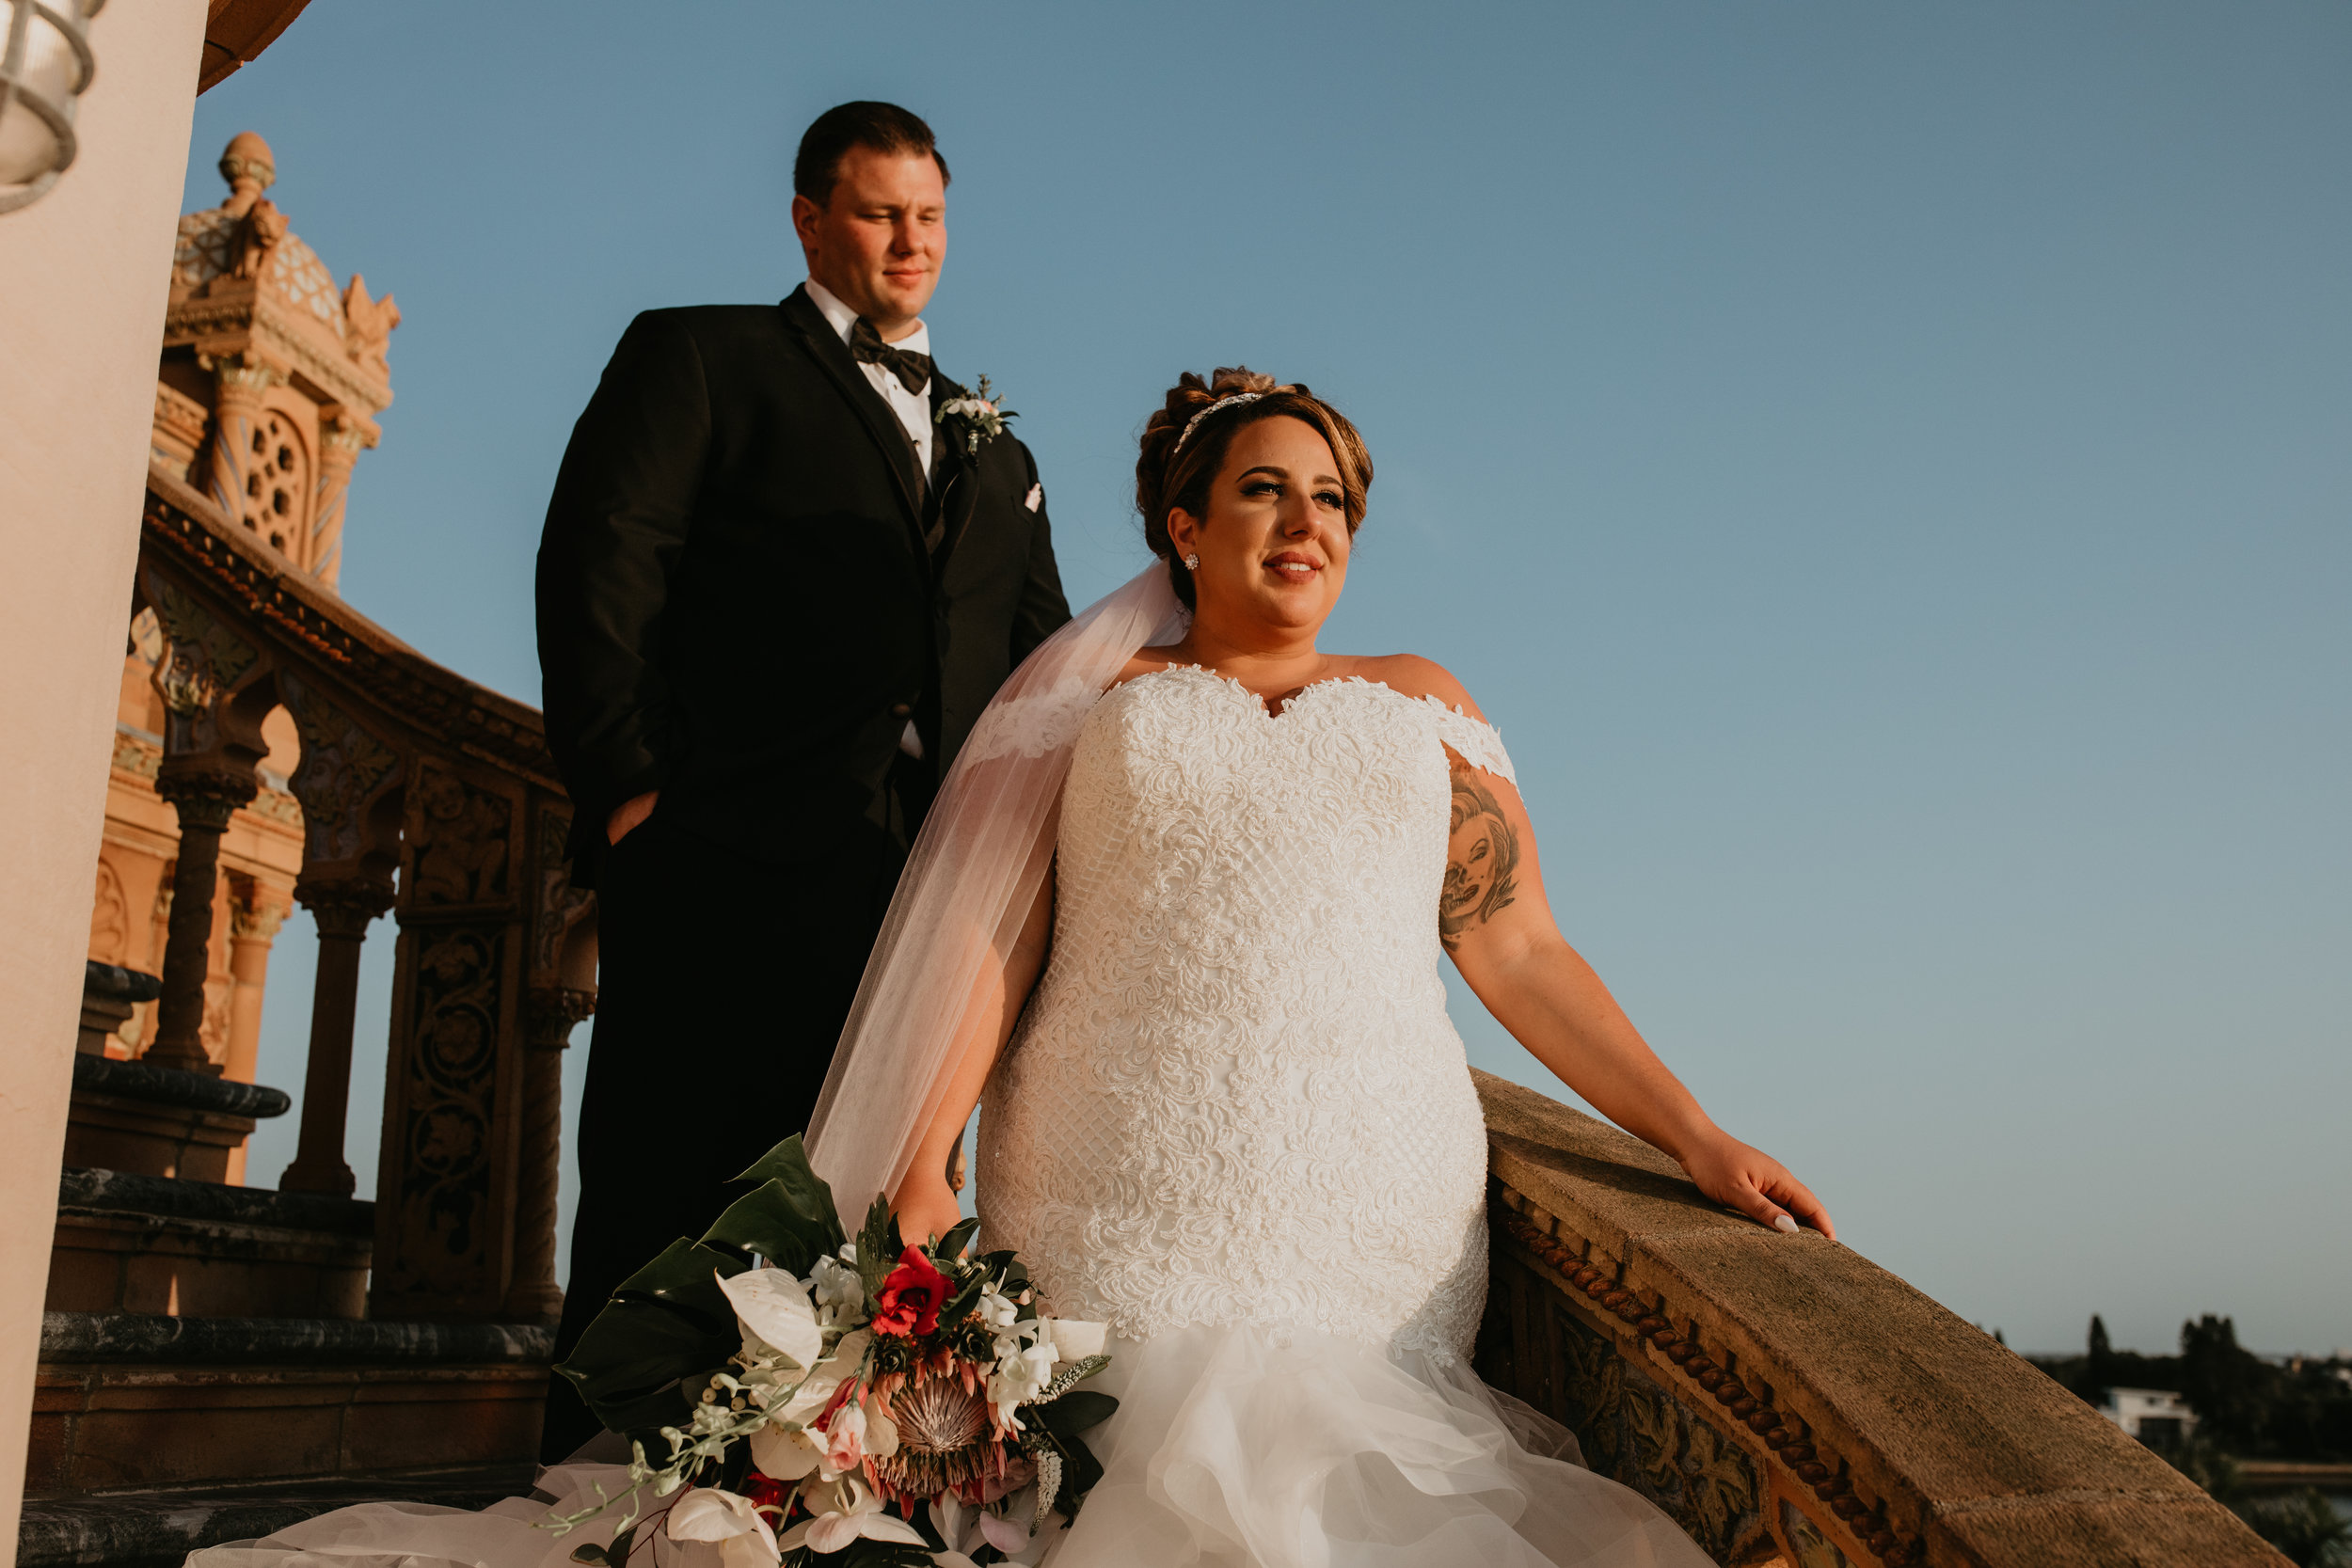 Ringling Museum Sarasota Florida-Wedding-Bianca and Michael91.JPG